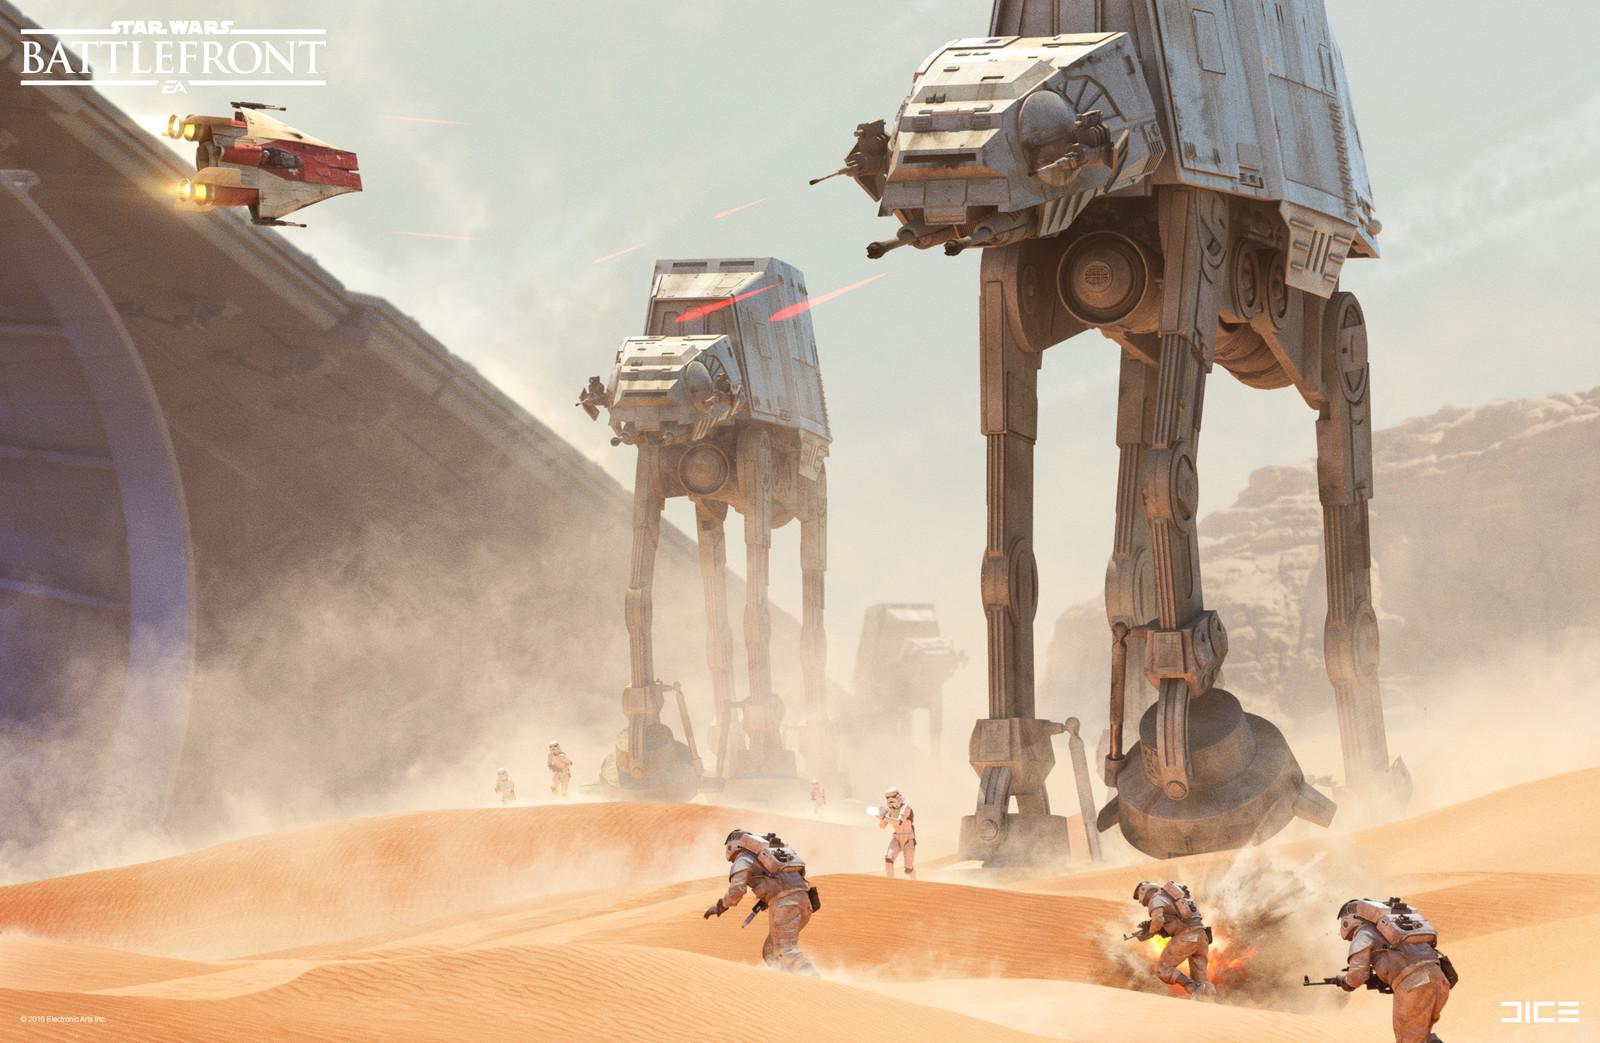 Jakku Key Art for the 2015 Star Wars Battlefront game (detail). (2015)